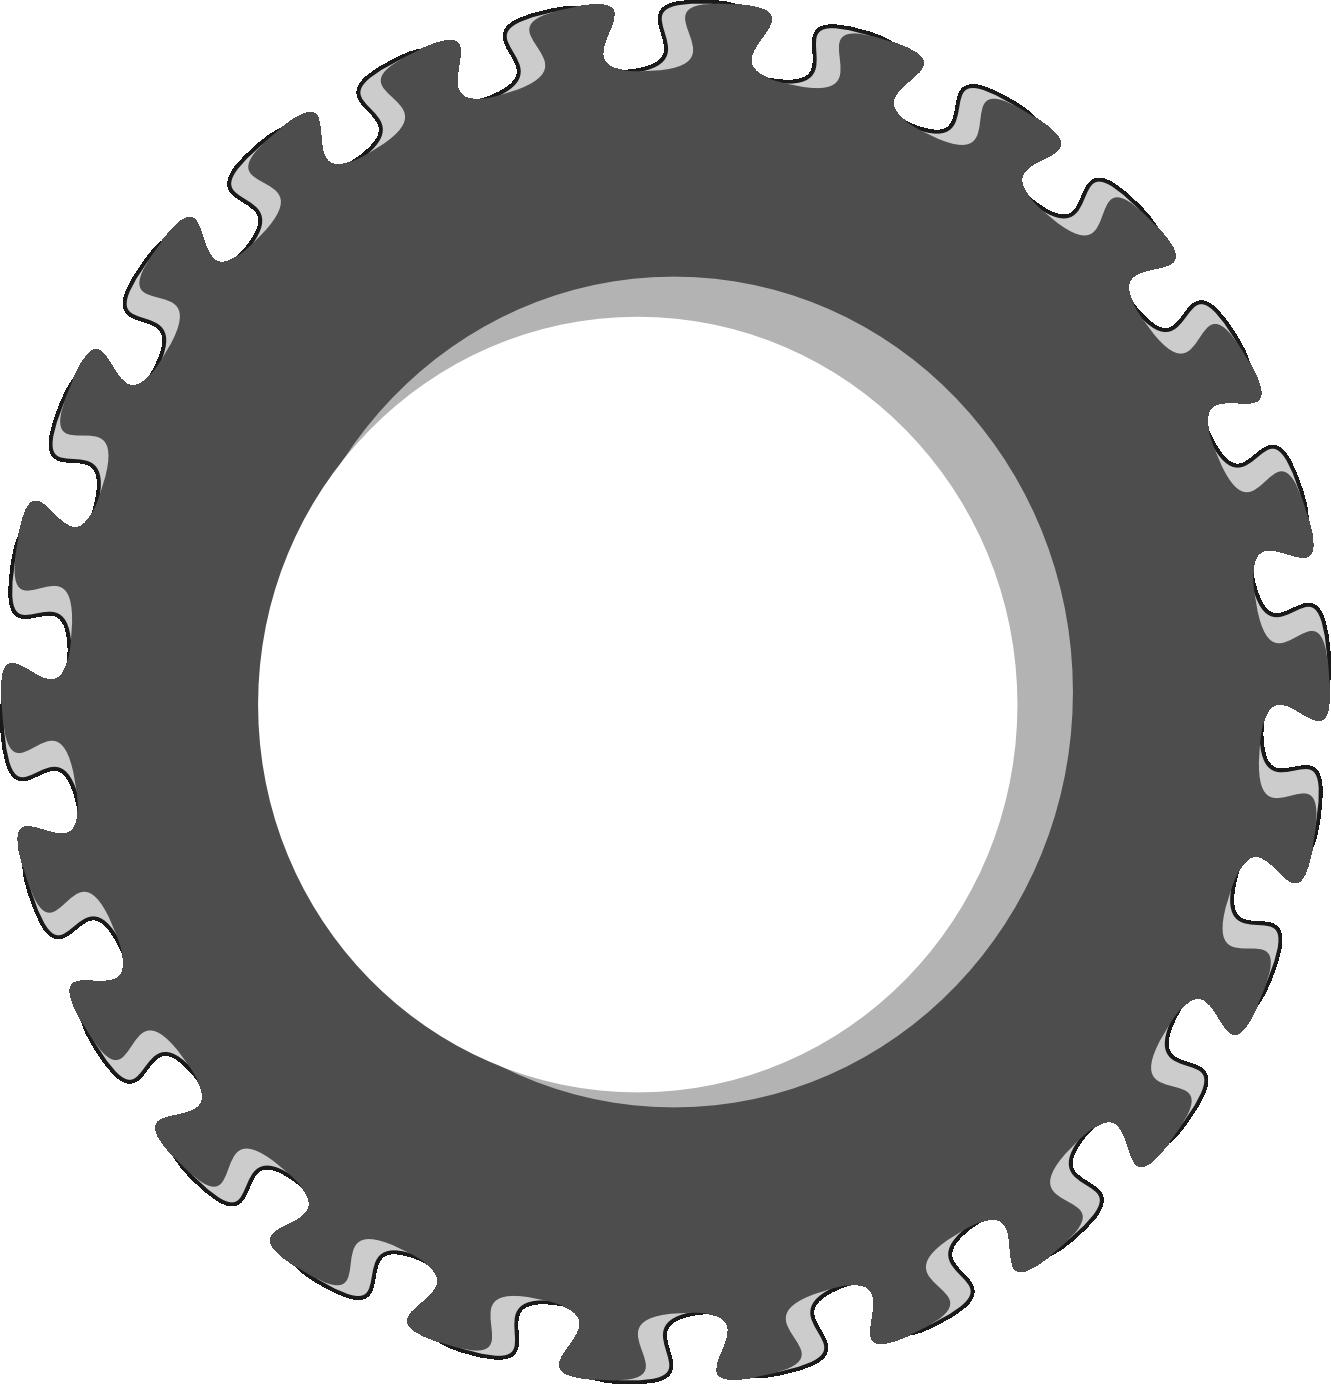 Gears clipart bike part Gear — Clipart of Gear